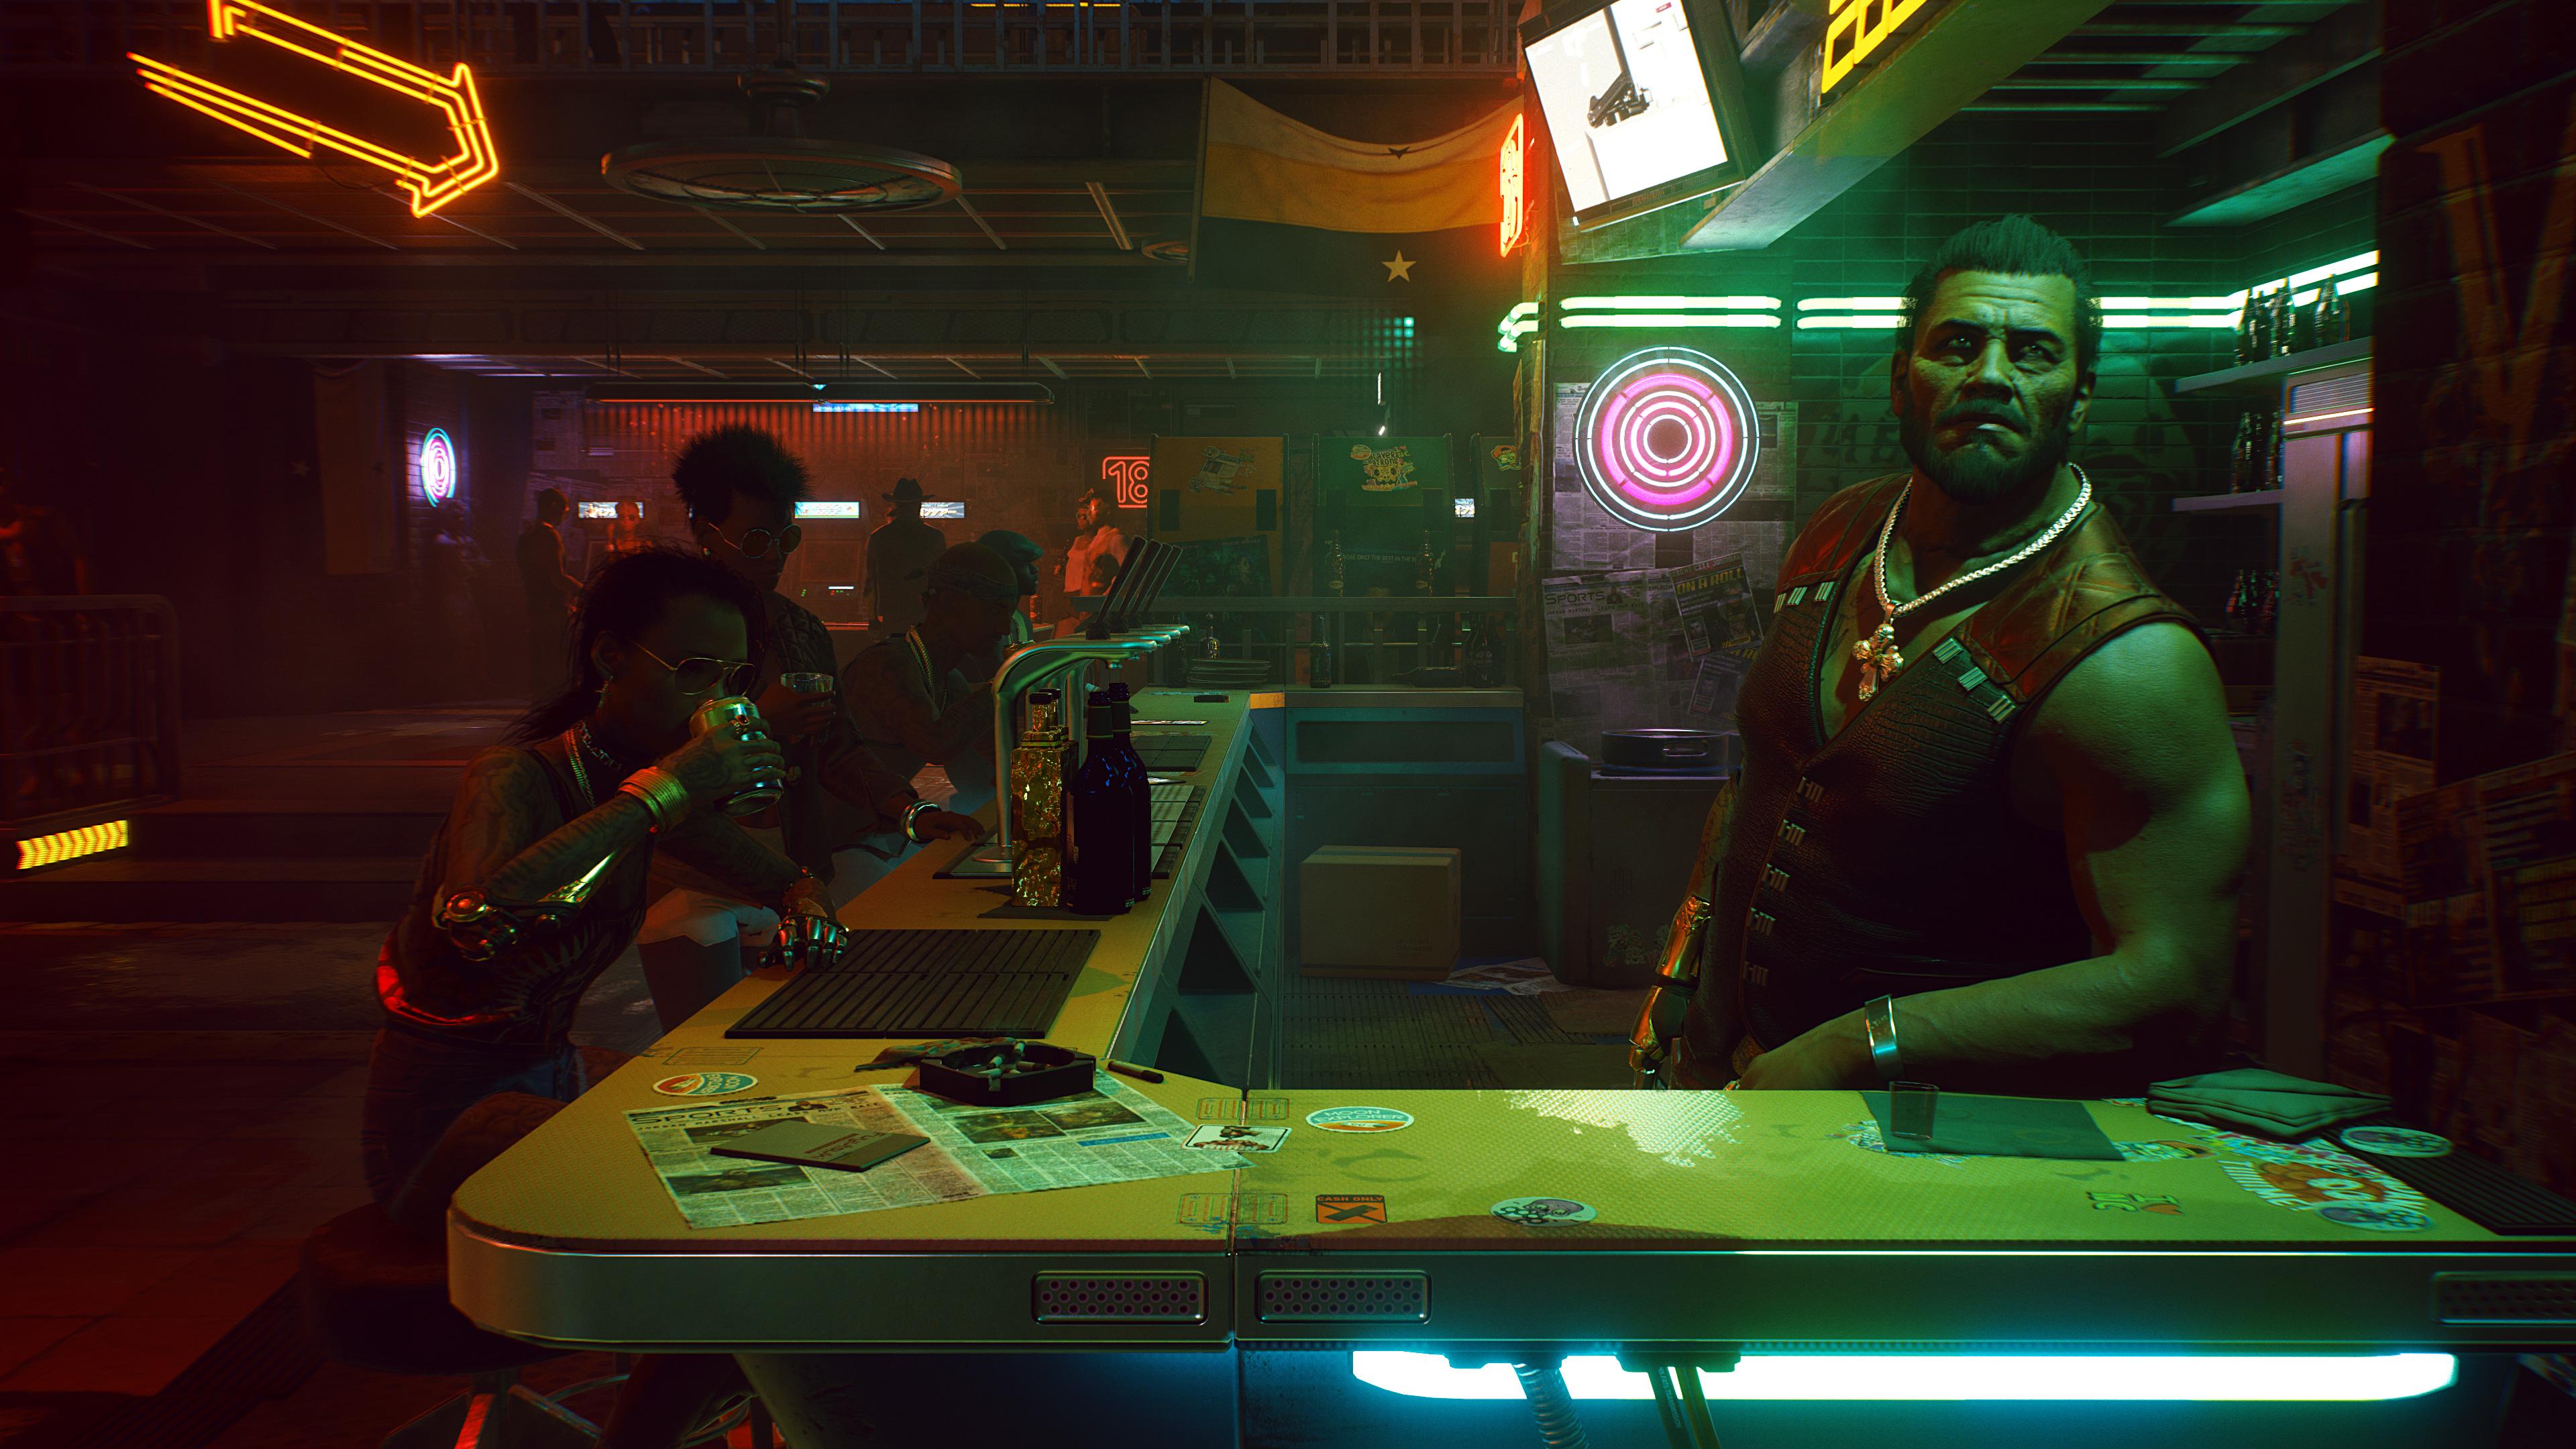 Man at a bar in Cyberpunk 2077